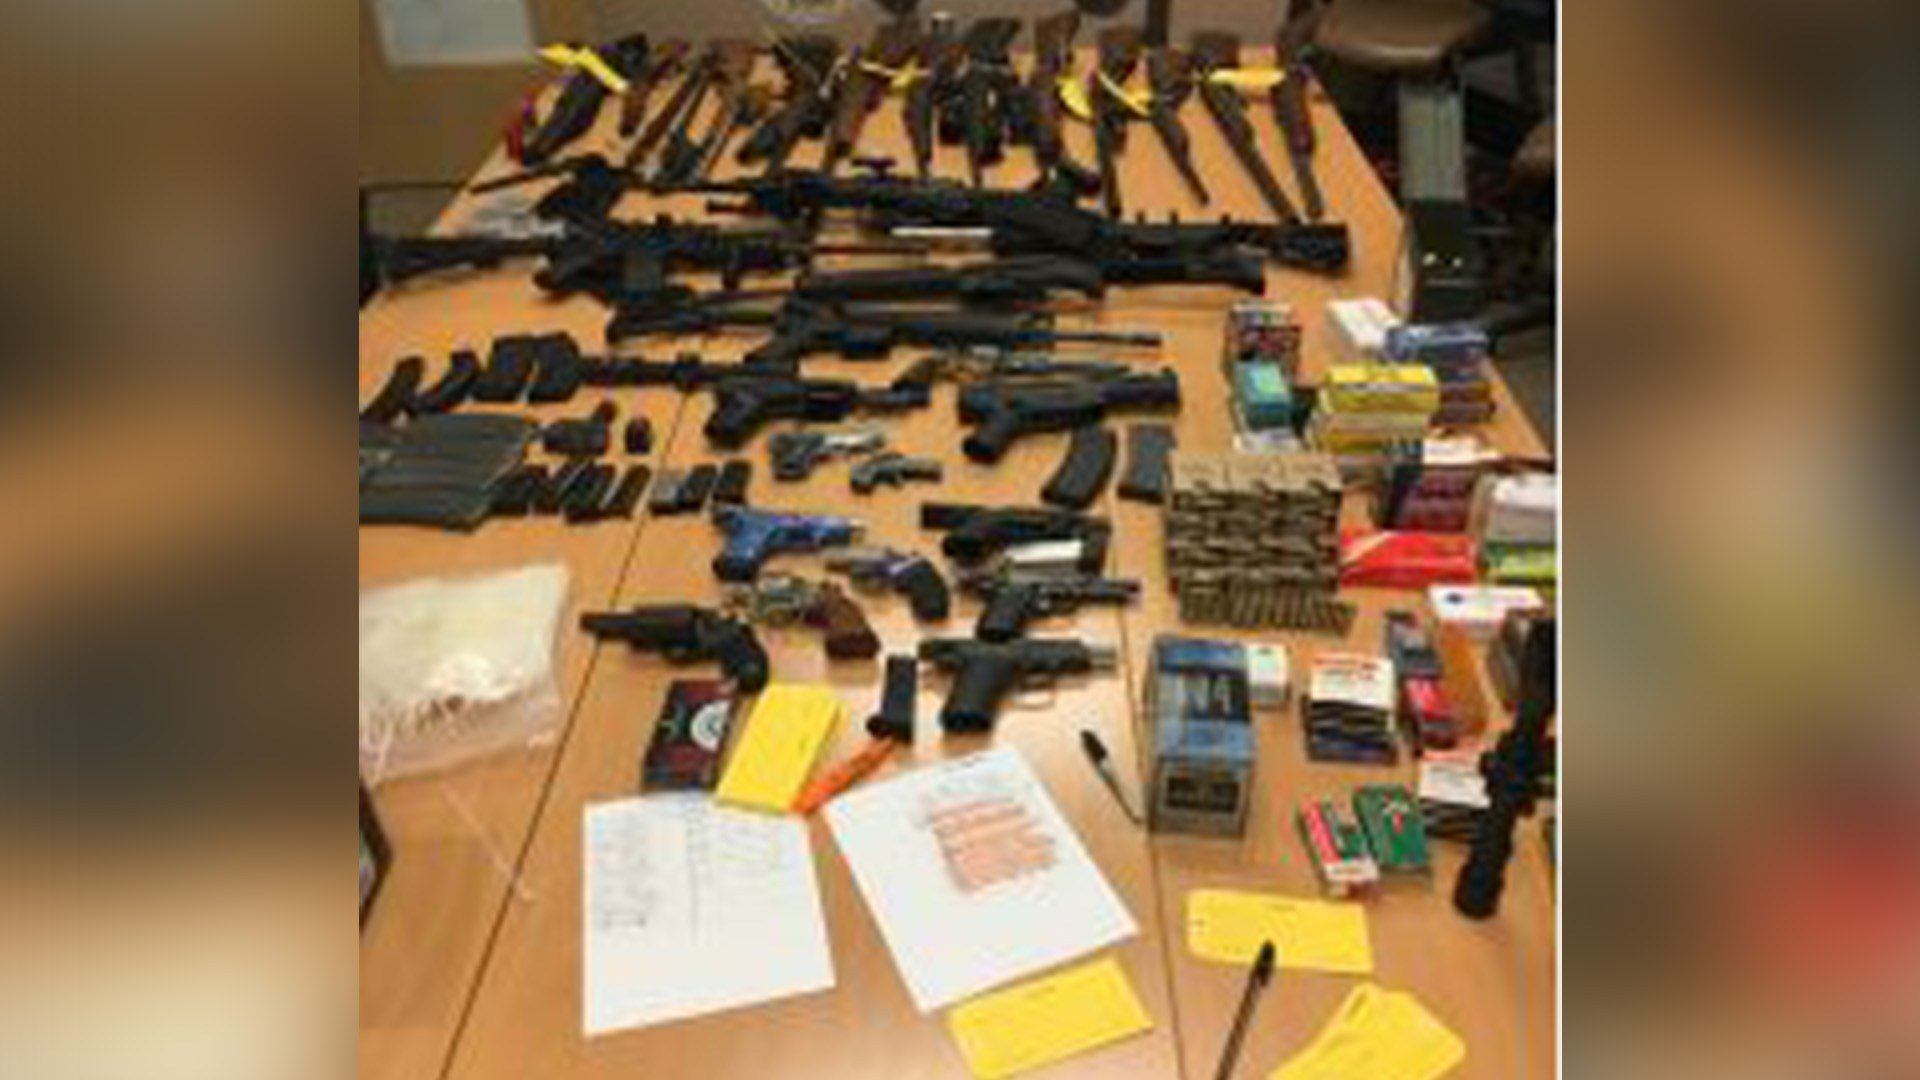 29 guns were seized in a search of a home in Pueblo.